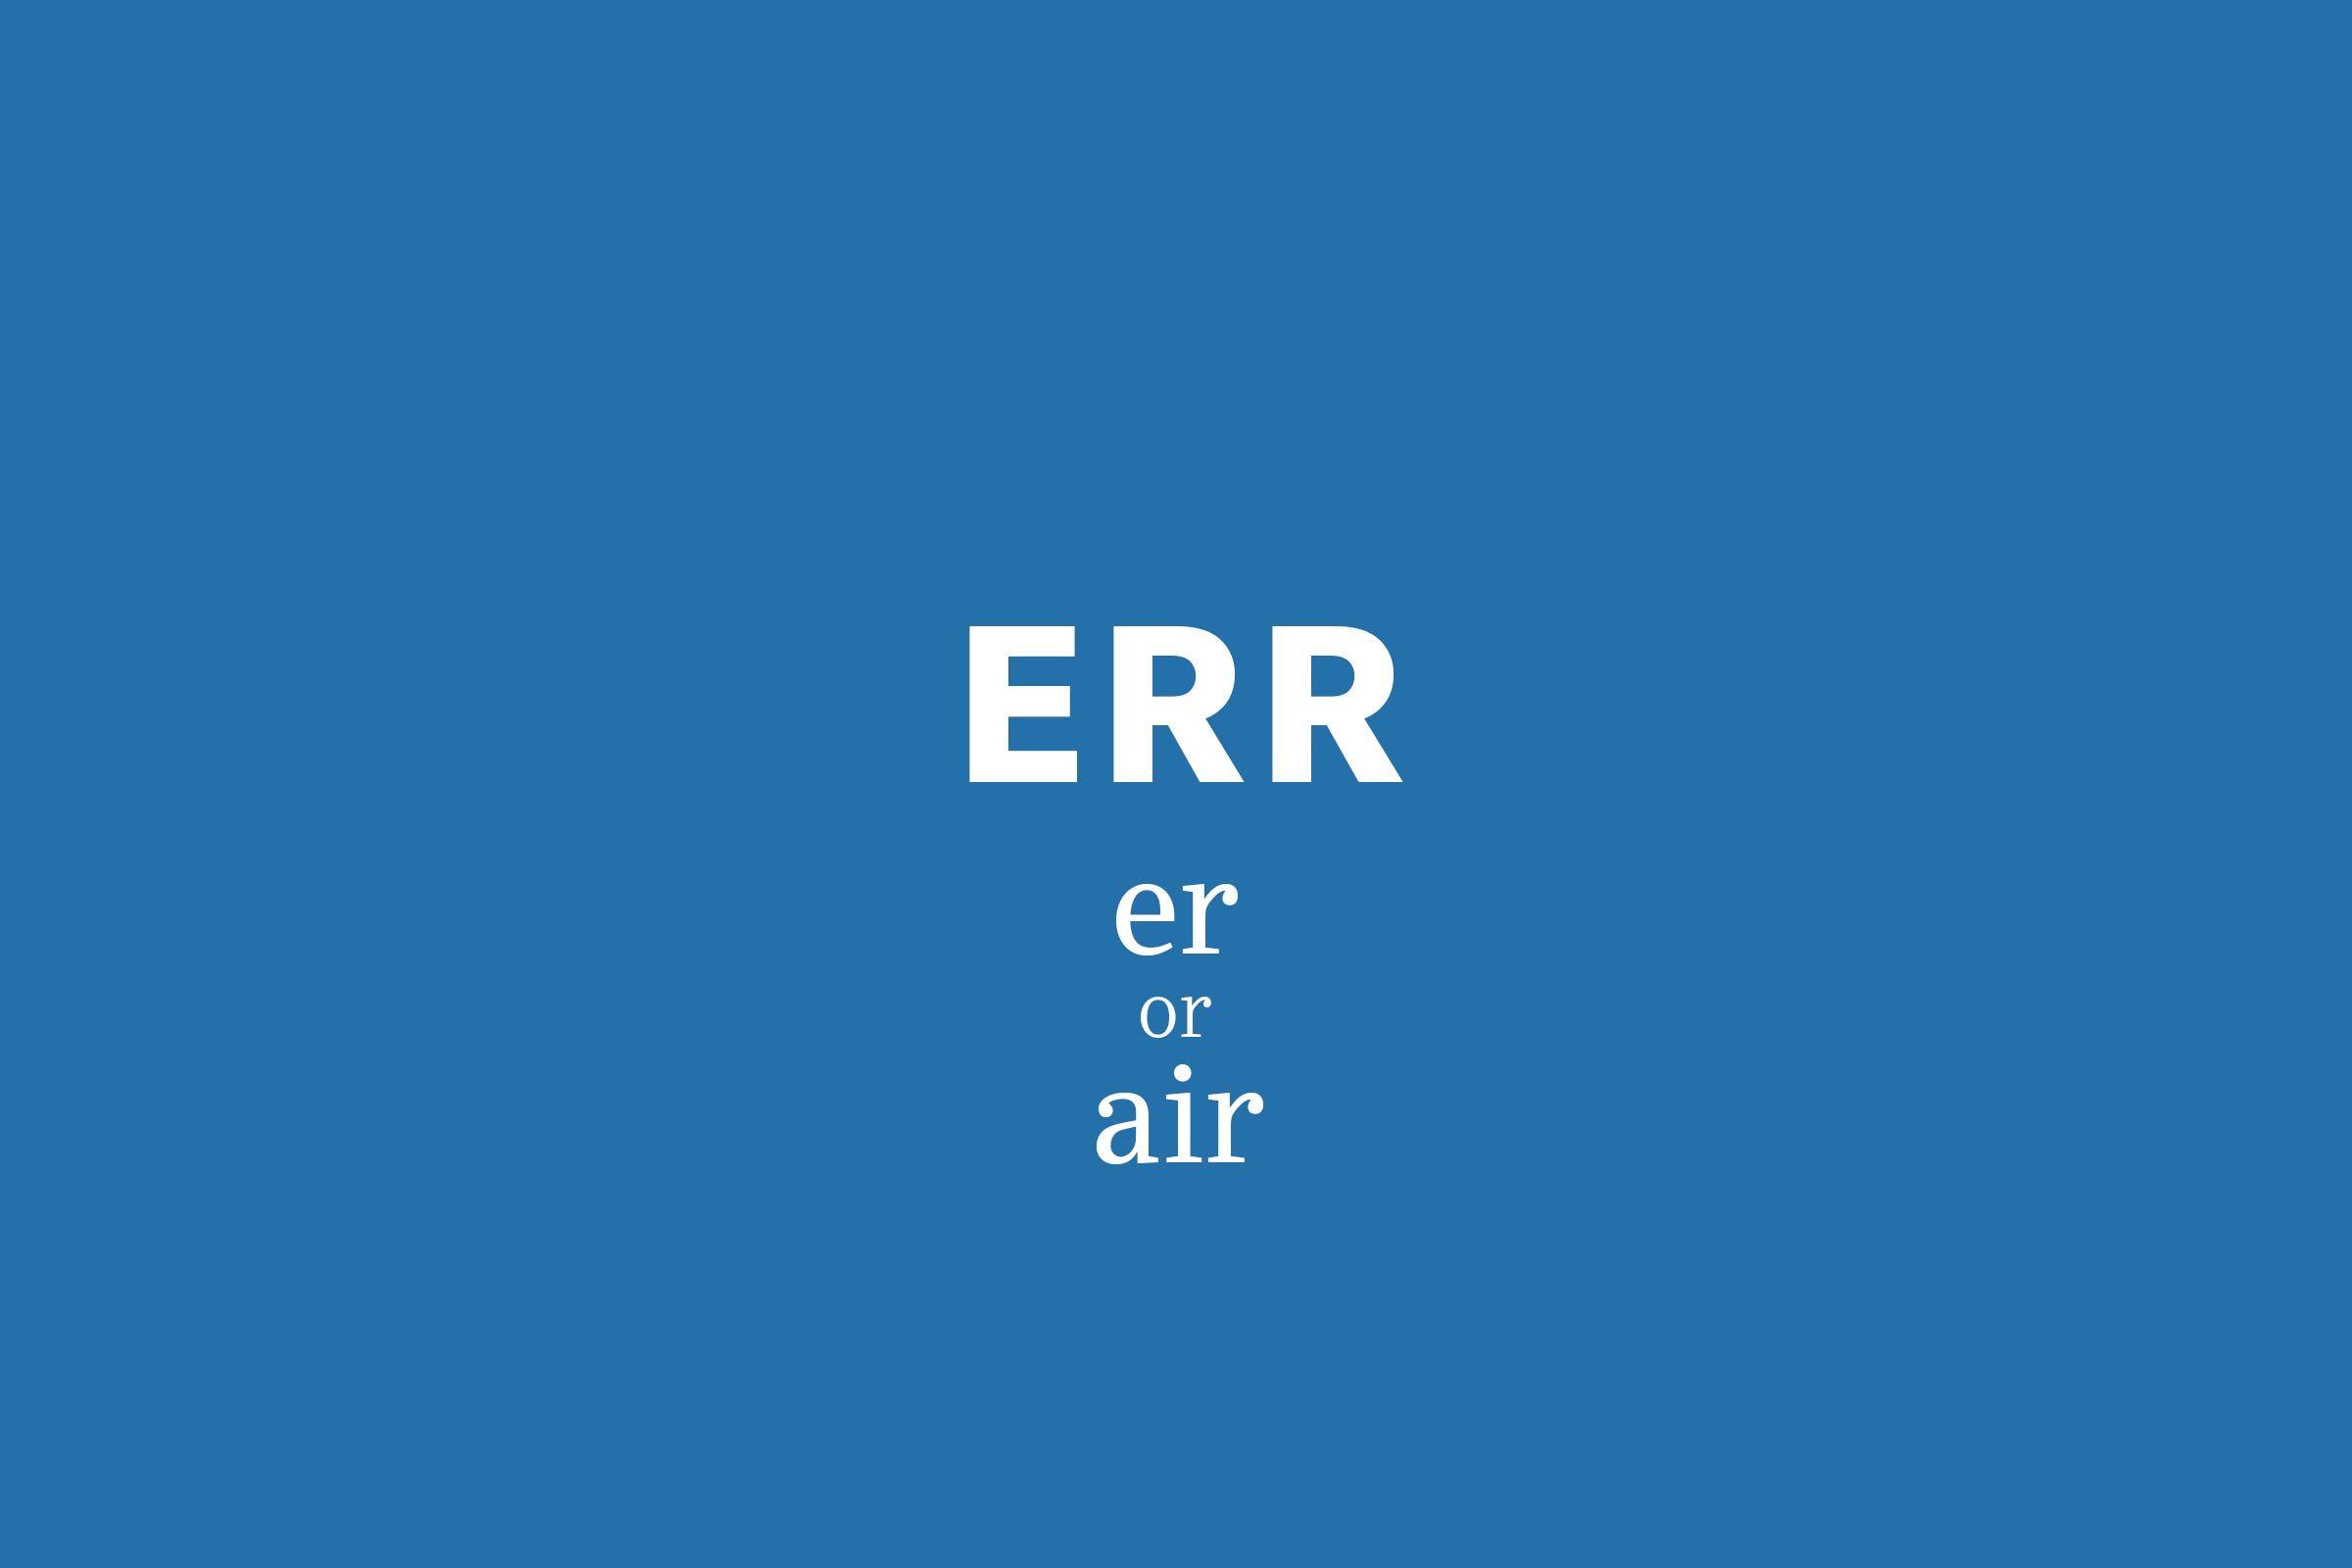 err pronunciation